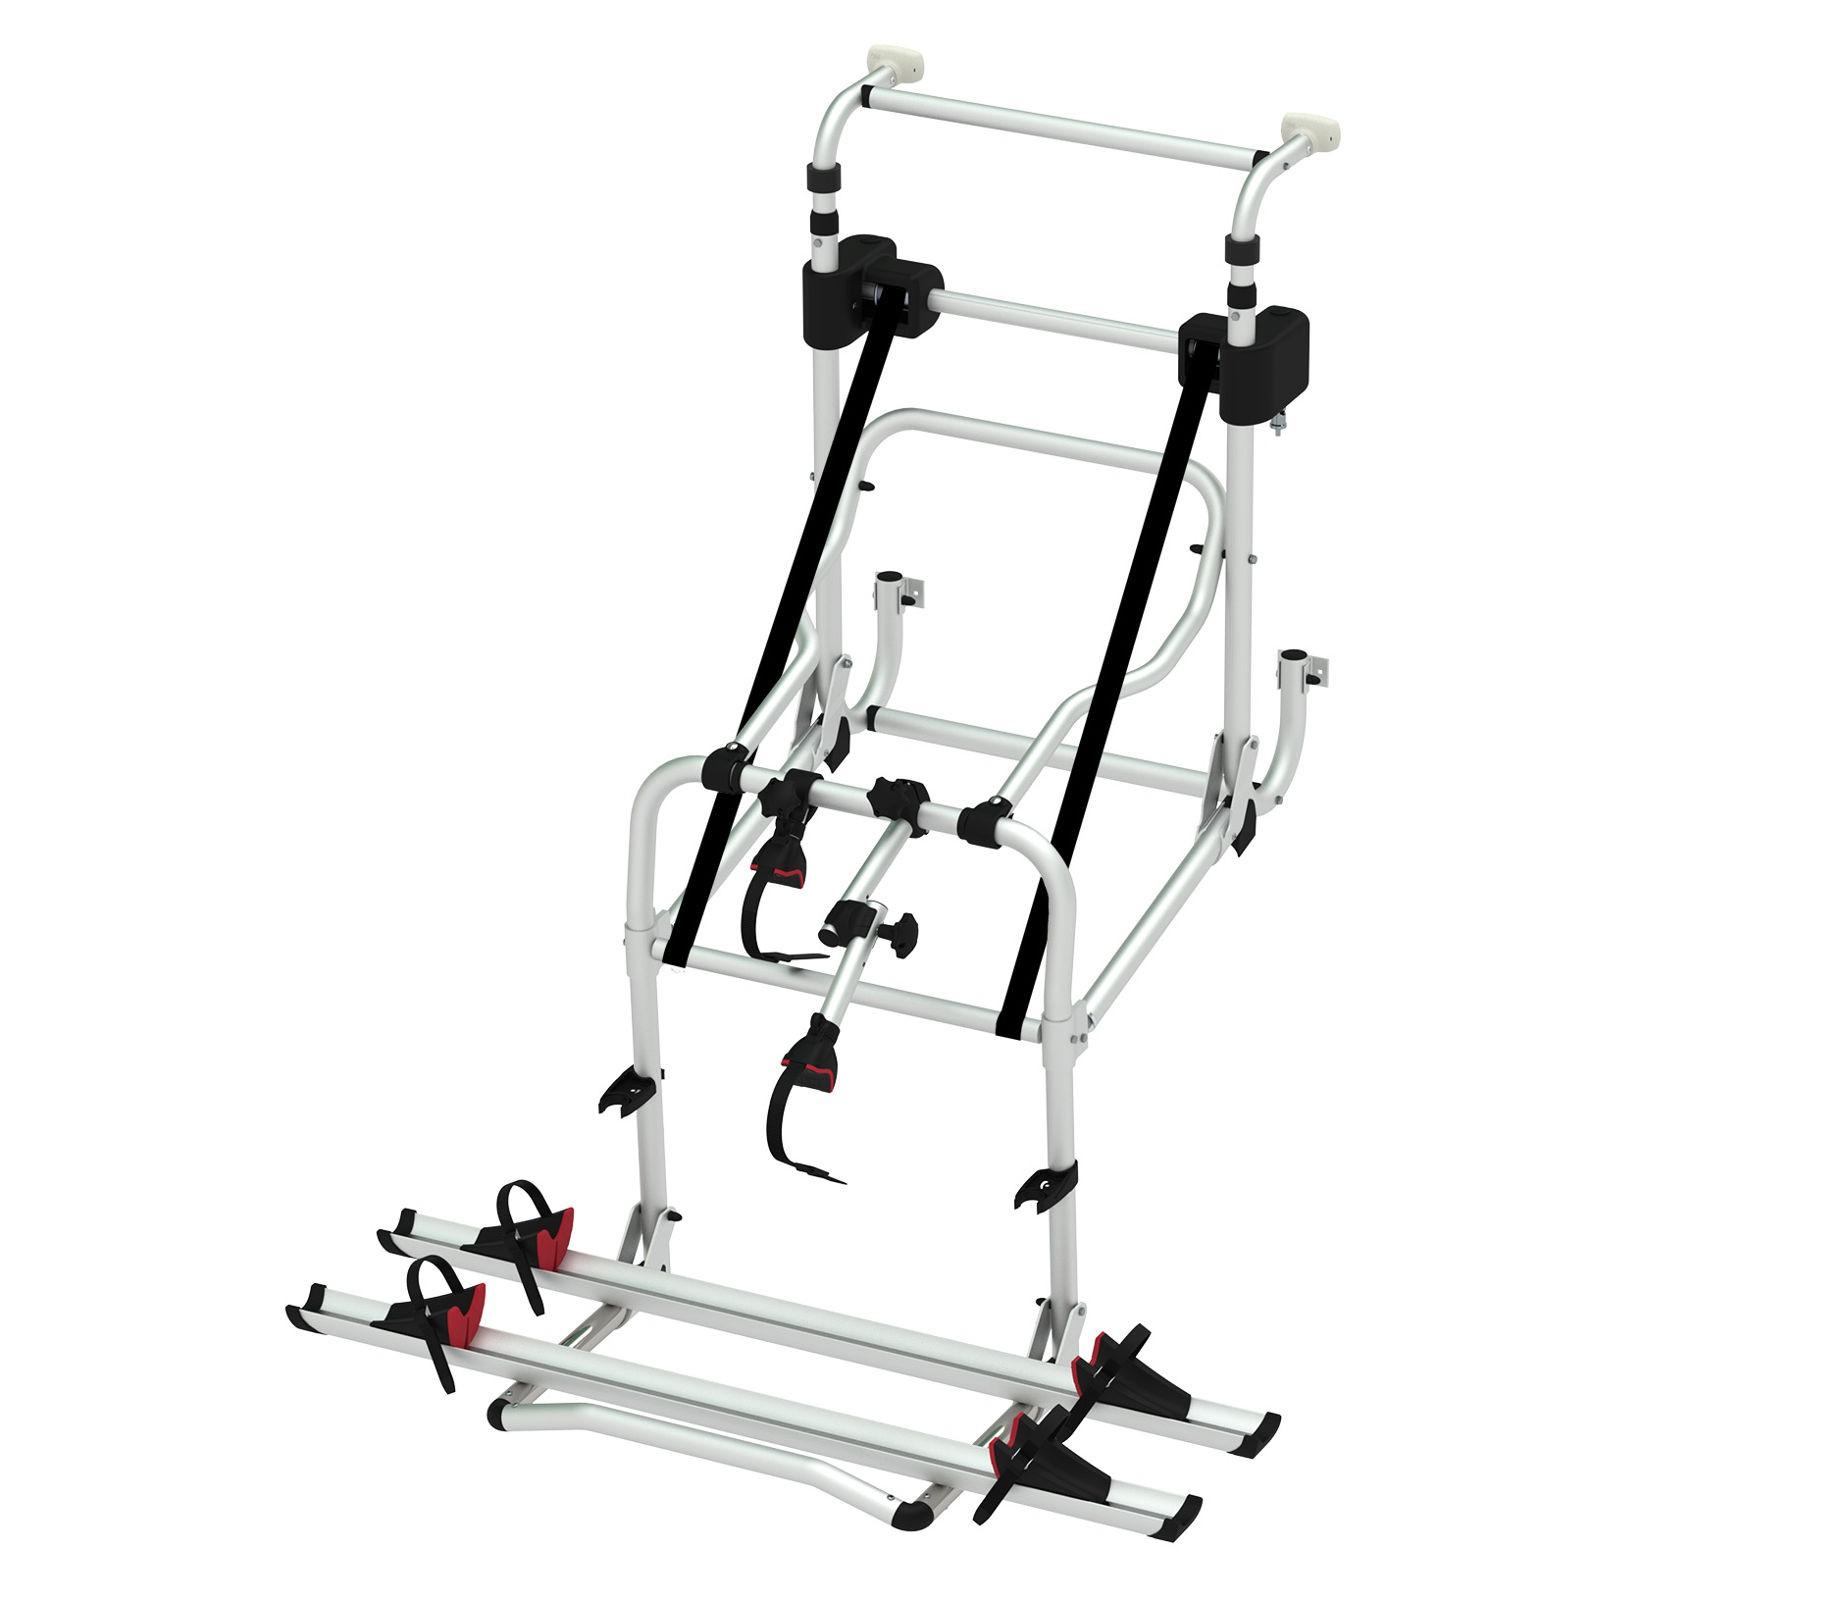 fiamma carry bike lift 77 e bike strengthen bike rack for electric bikes. Black Bedroom Furniture Sets. Home Design Ideas